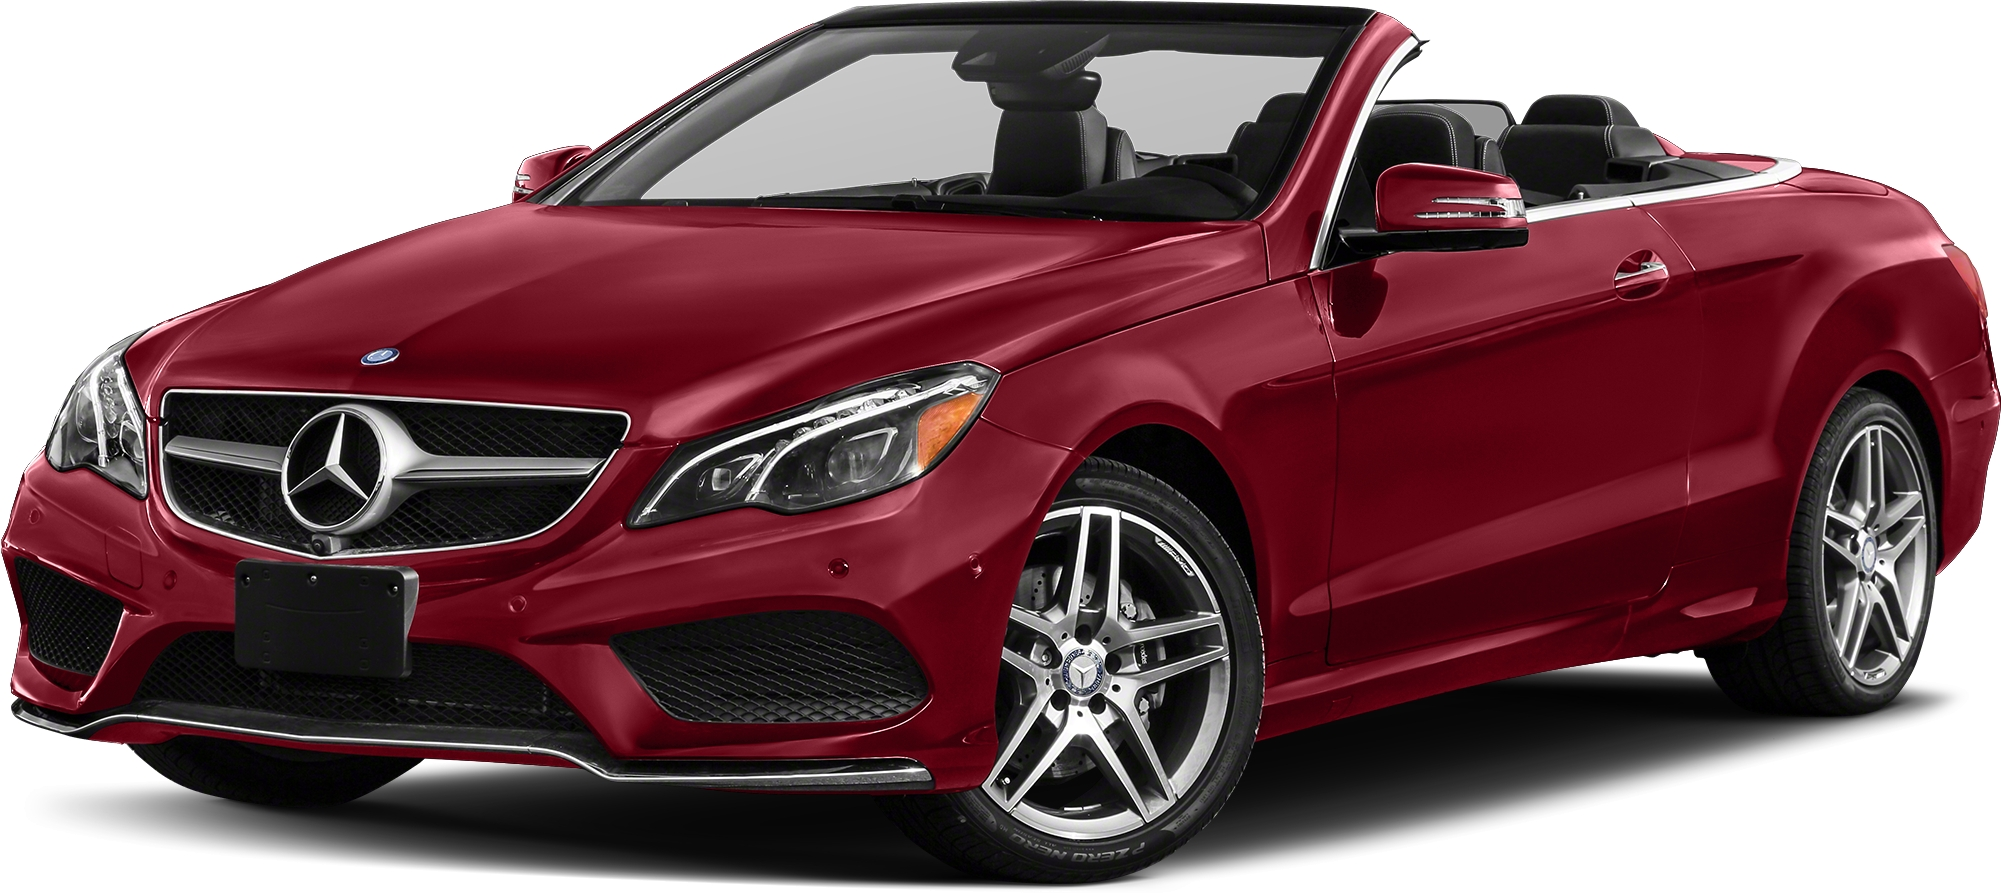 2014 mercedes benz e class e 350 new rochelle ny 20809789 for Mercedes benz new rochelle ny